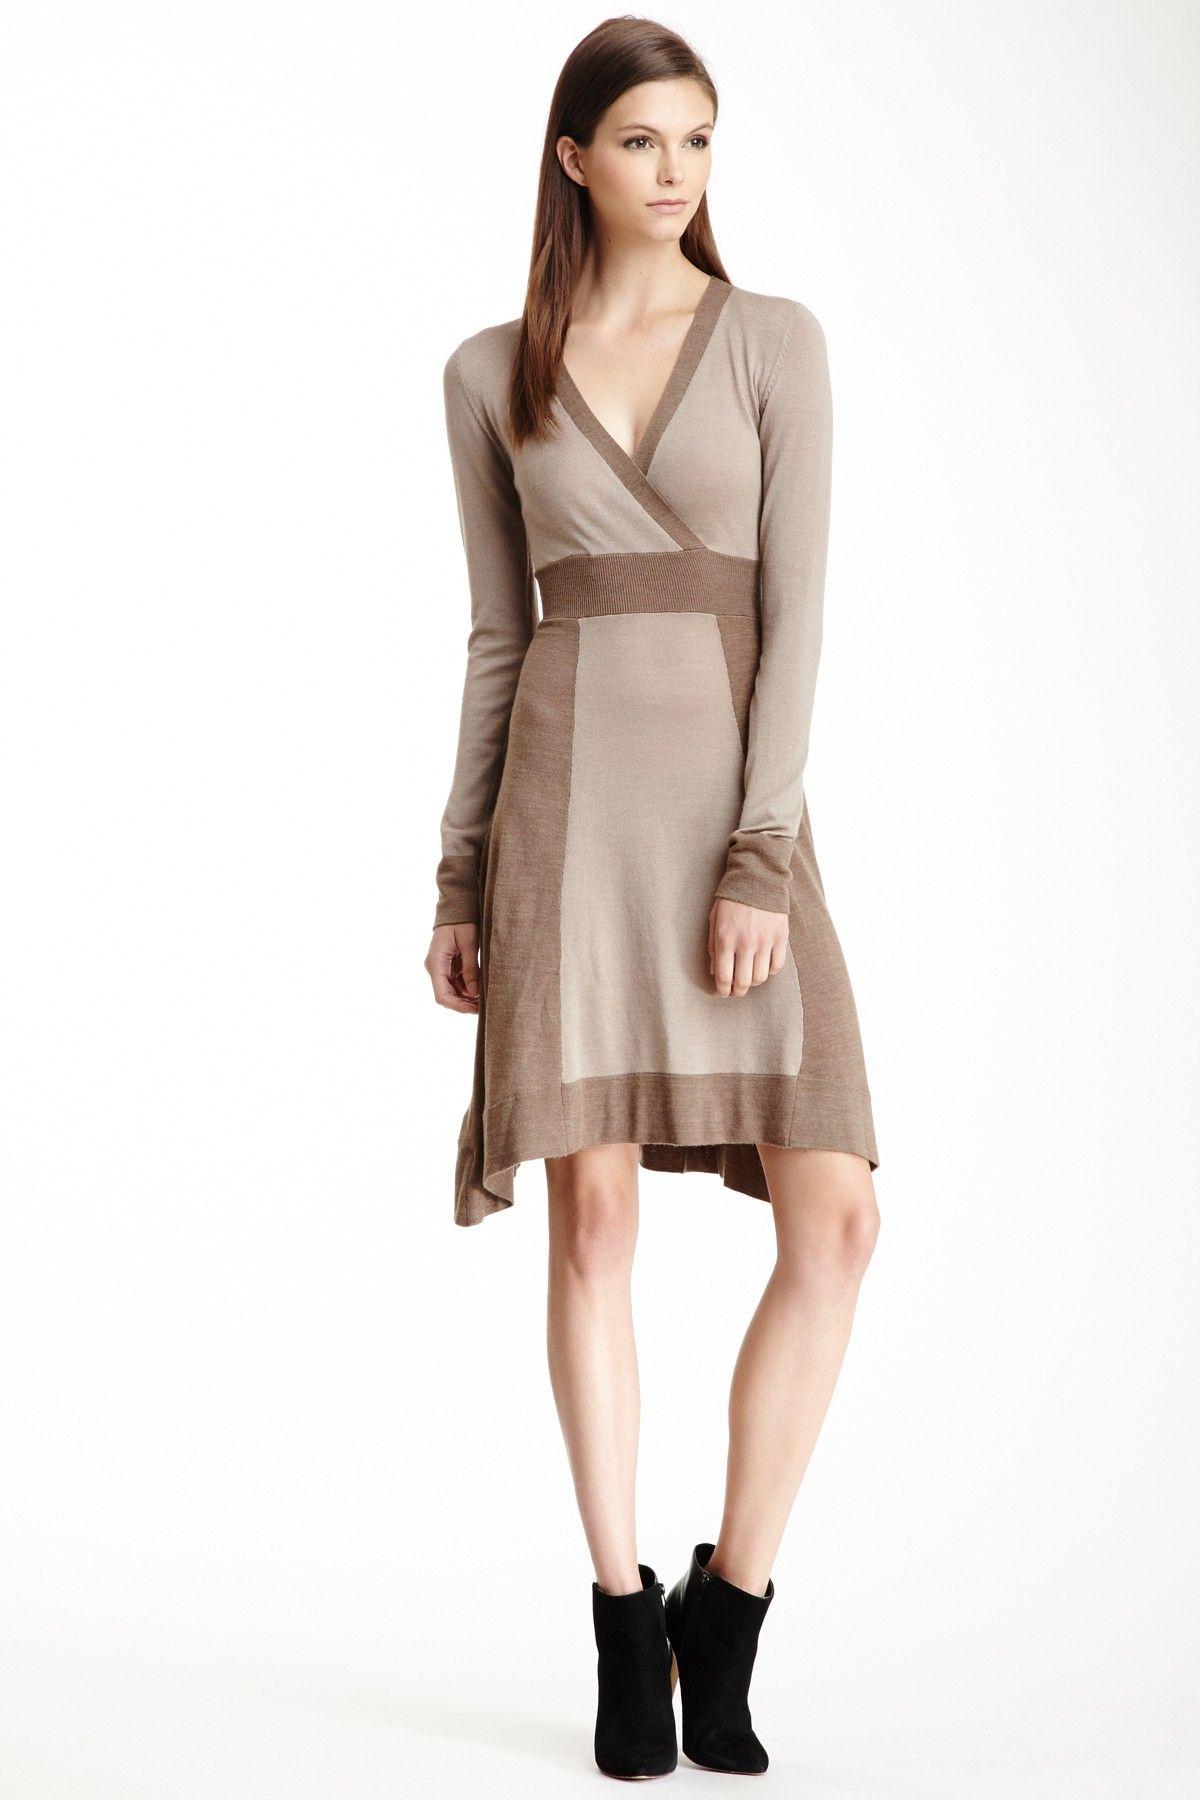 BCBGMAXAZRIA Sandra Surplice Neck Wool Dress  DressWomen #Dresses